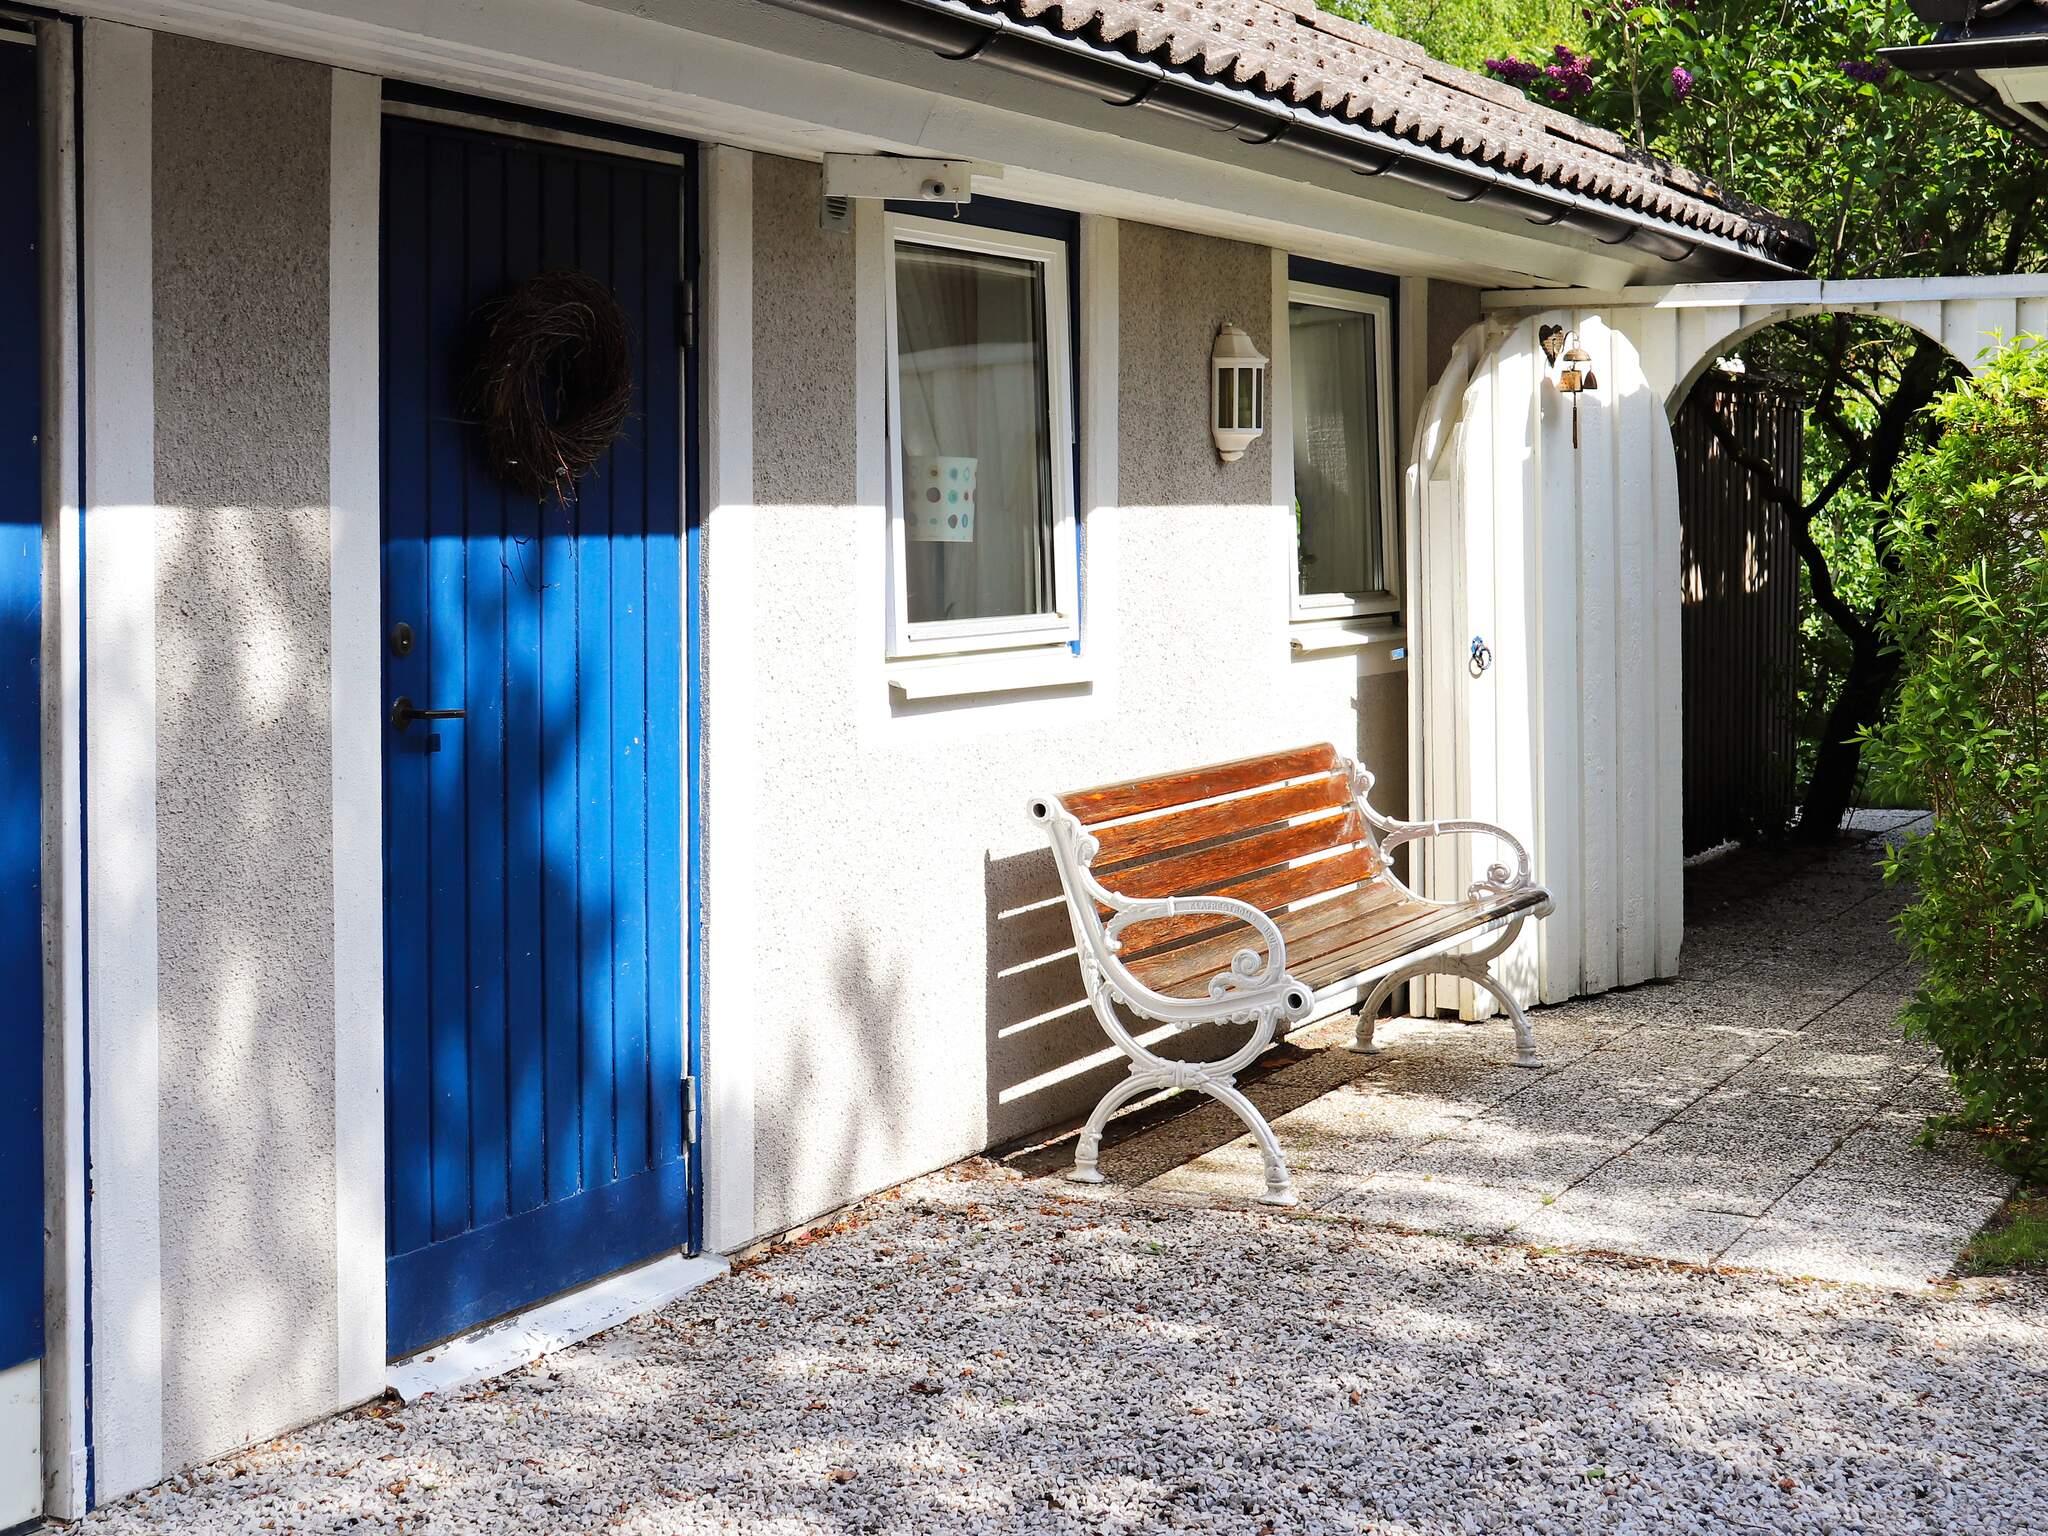 Ferienhaus Höllviken (2624334), Höllviken, Skane län, Südschweden, Schweden, Bild 14